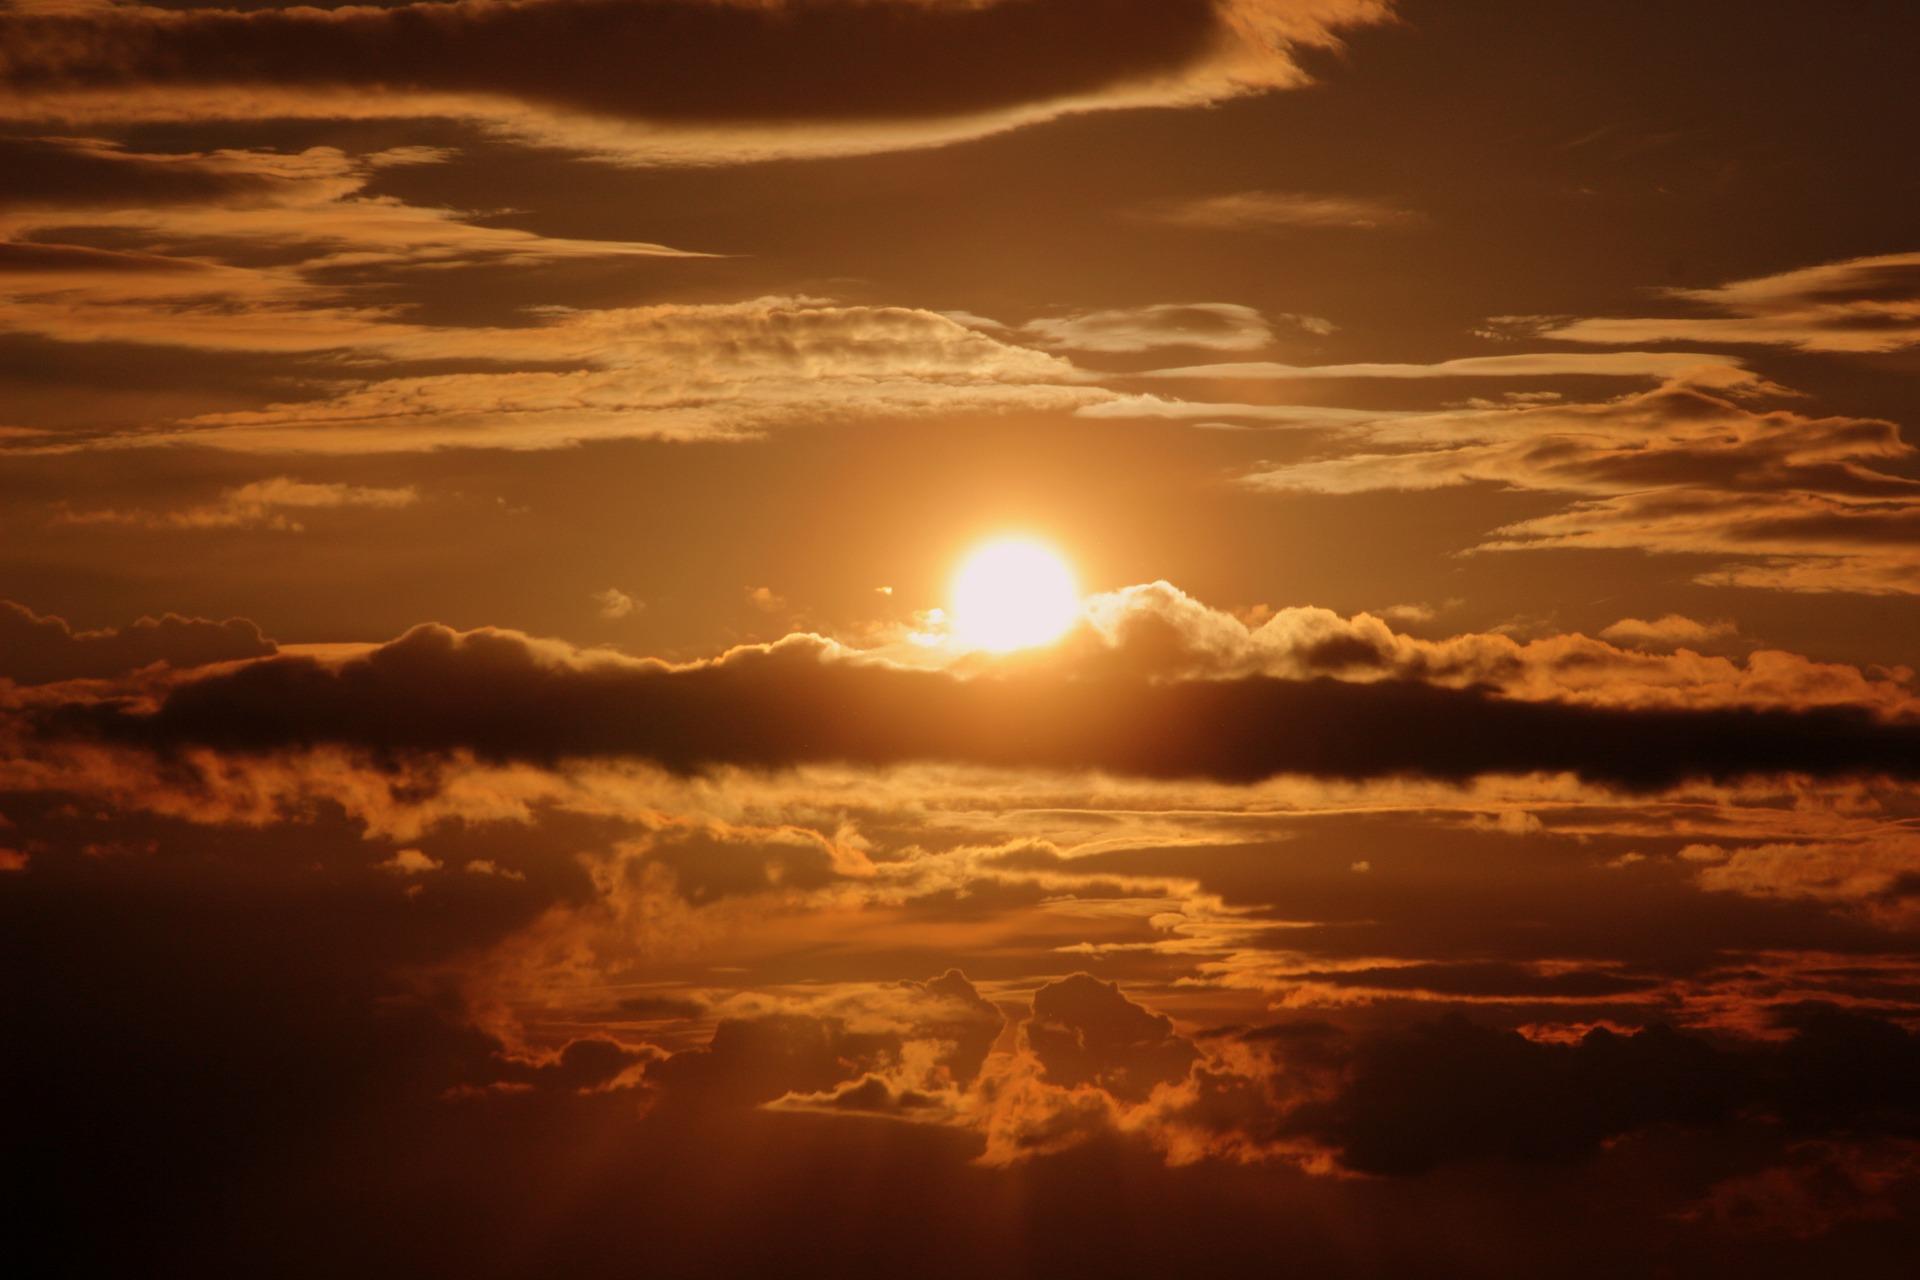 sunset-1457632_1920